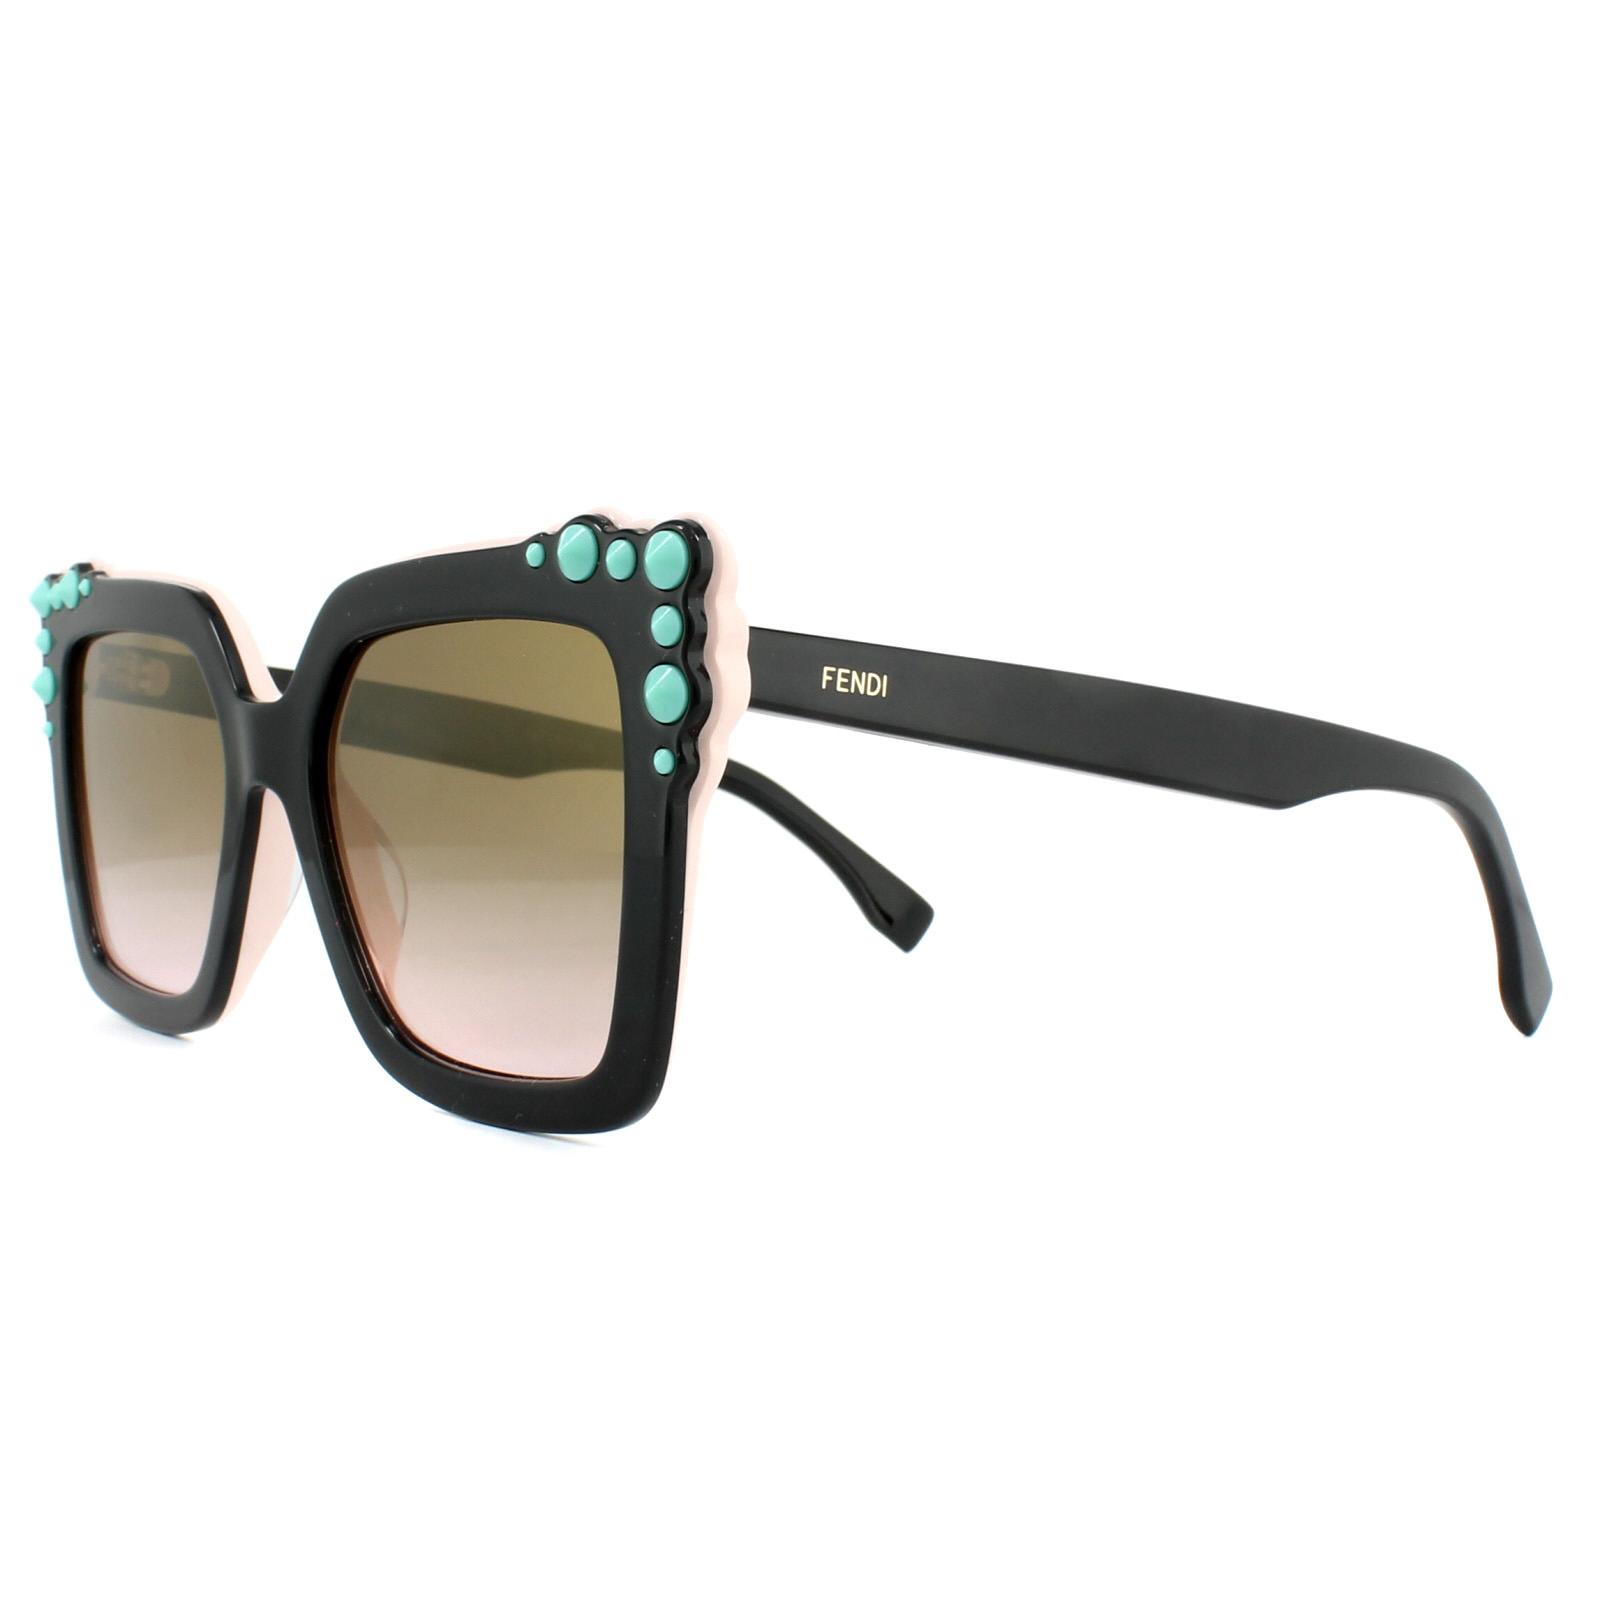 5e54abd4875b Sentinel Fendi Sunglasses Can Eye FF 0260/S 3H2 53 Black Pink Brown  Gradient Pink